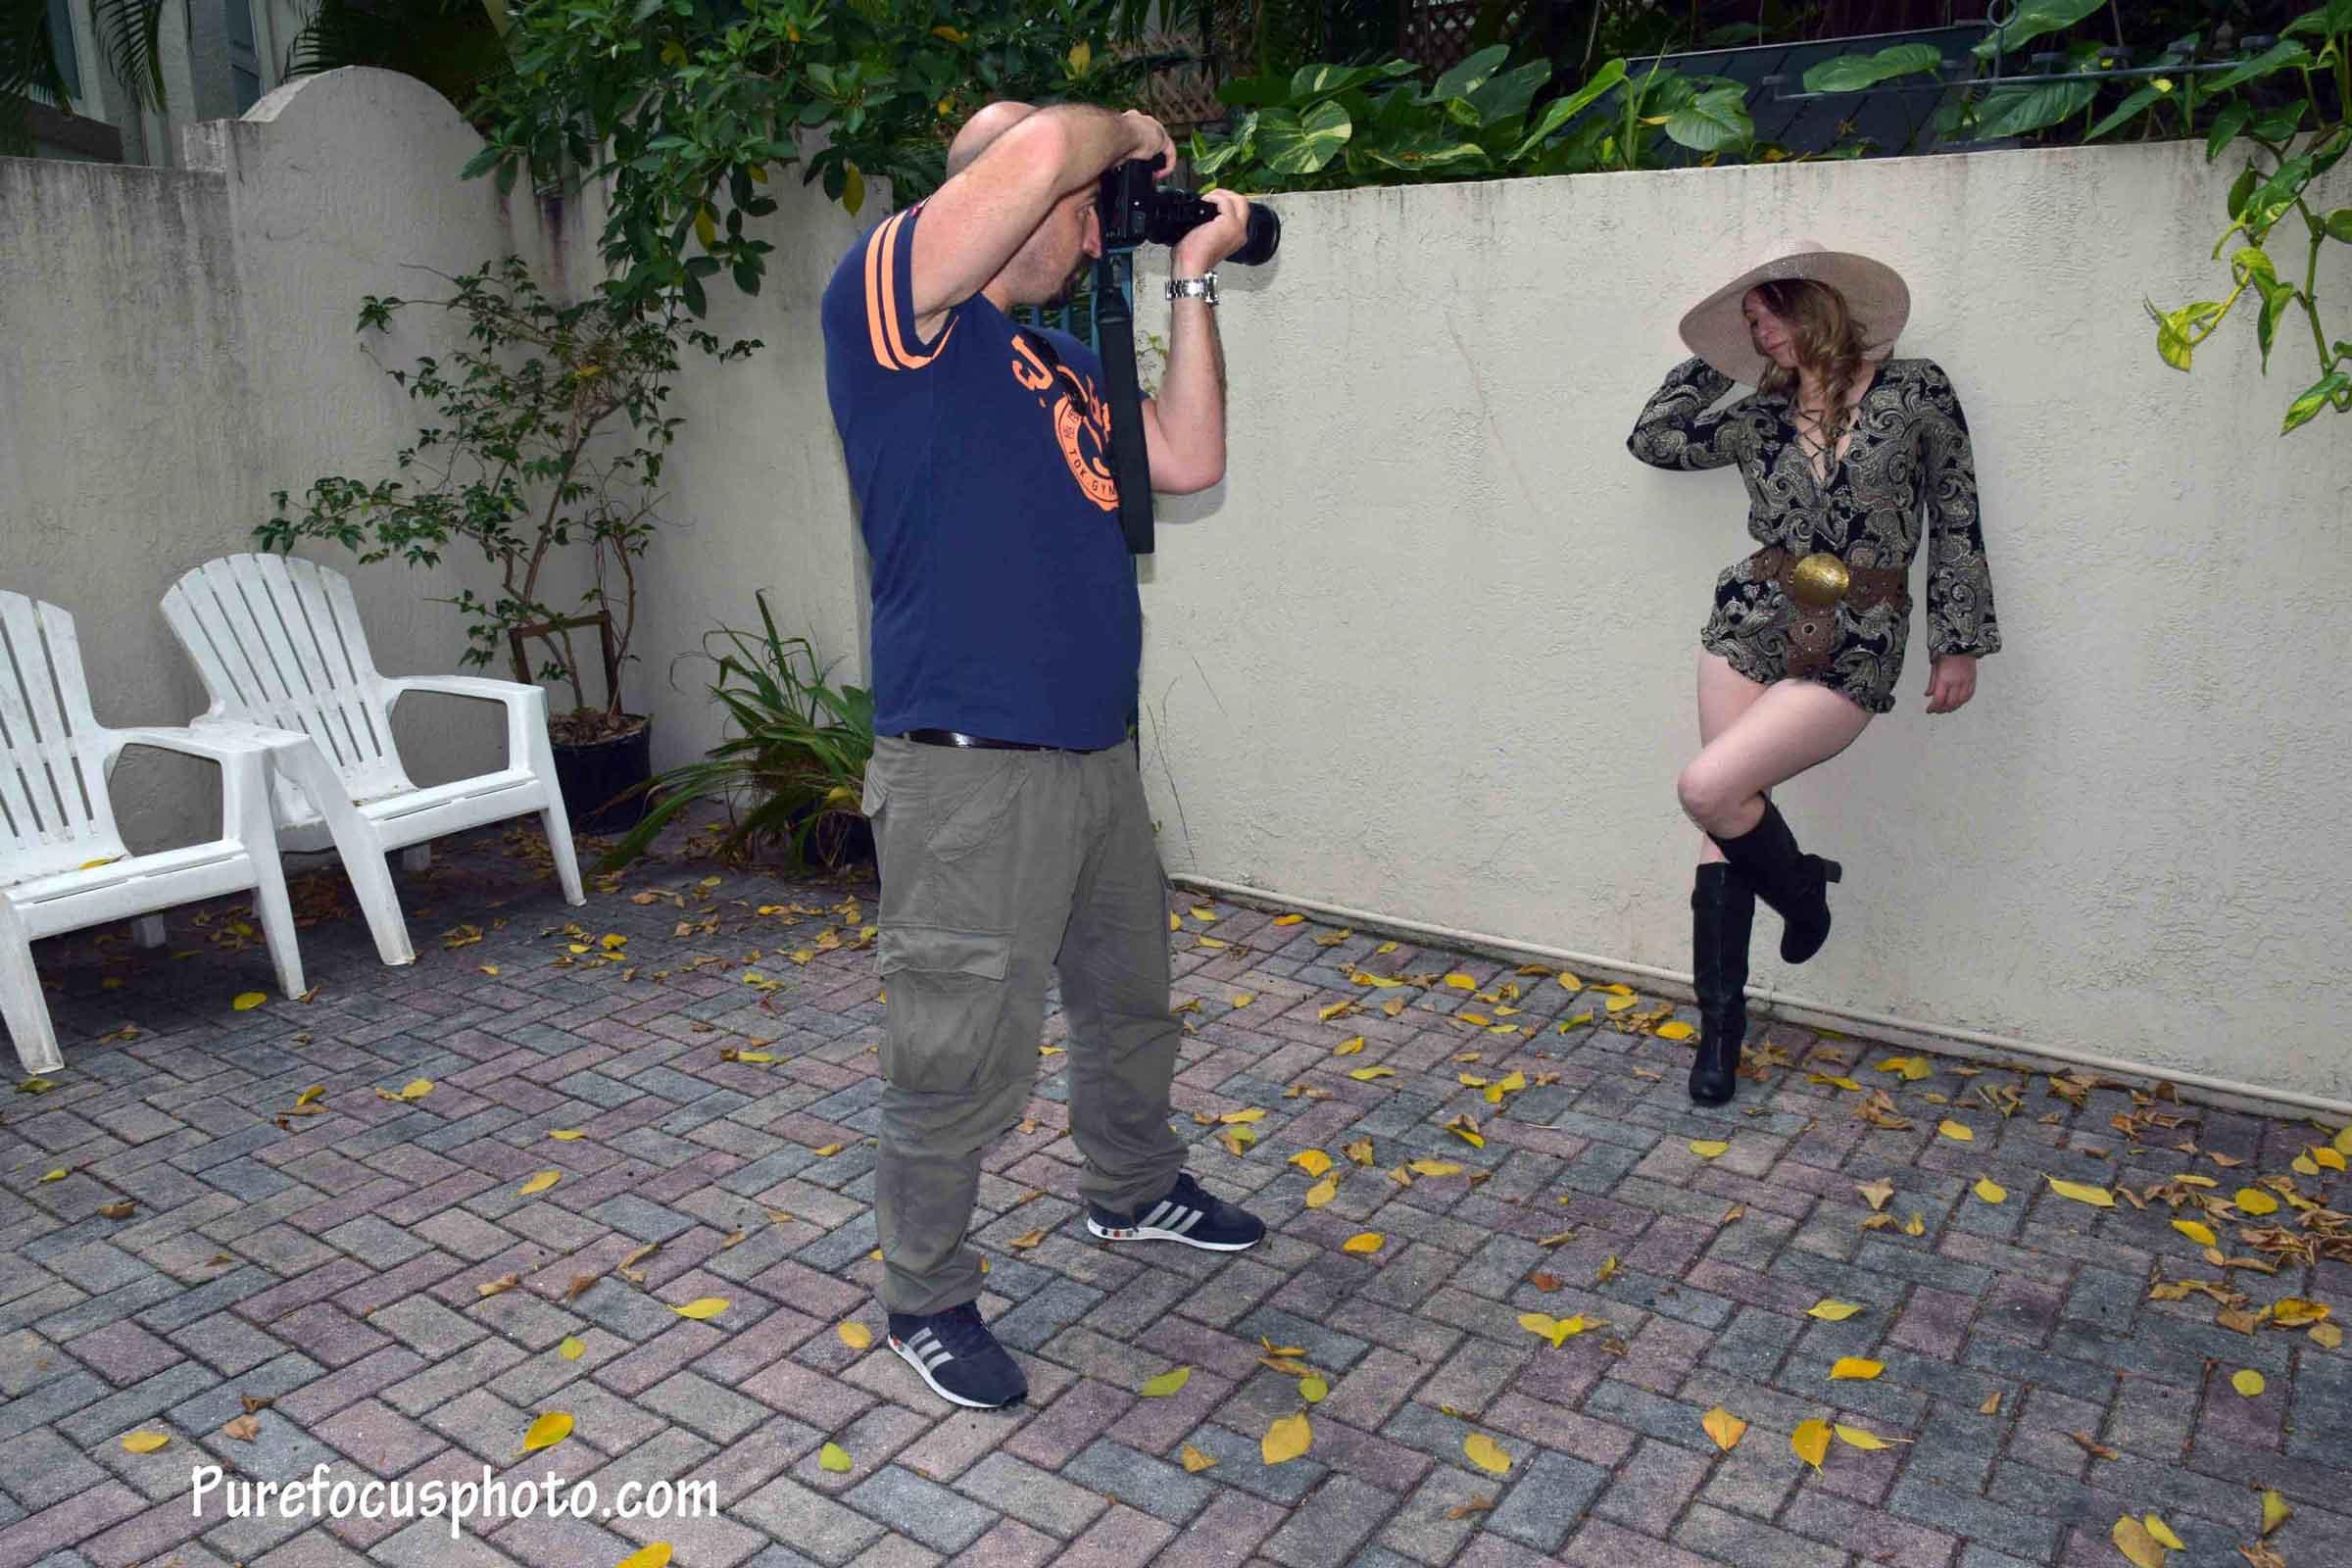 Shooting the shooter :-)